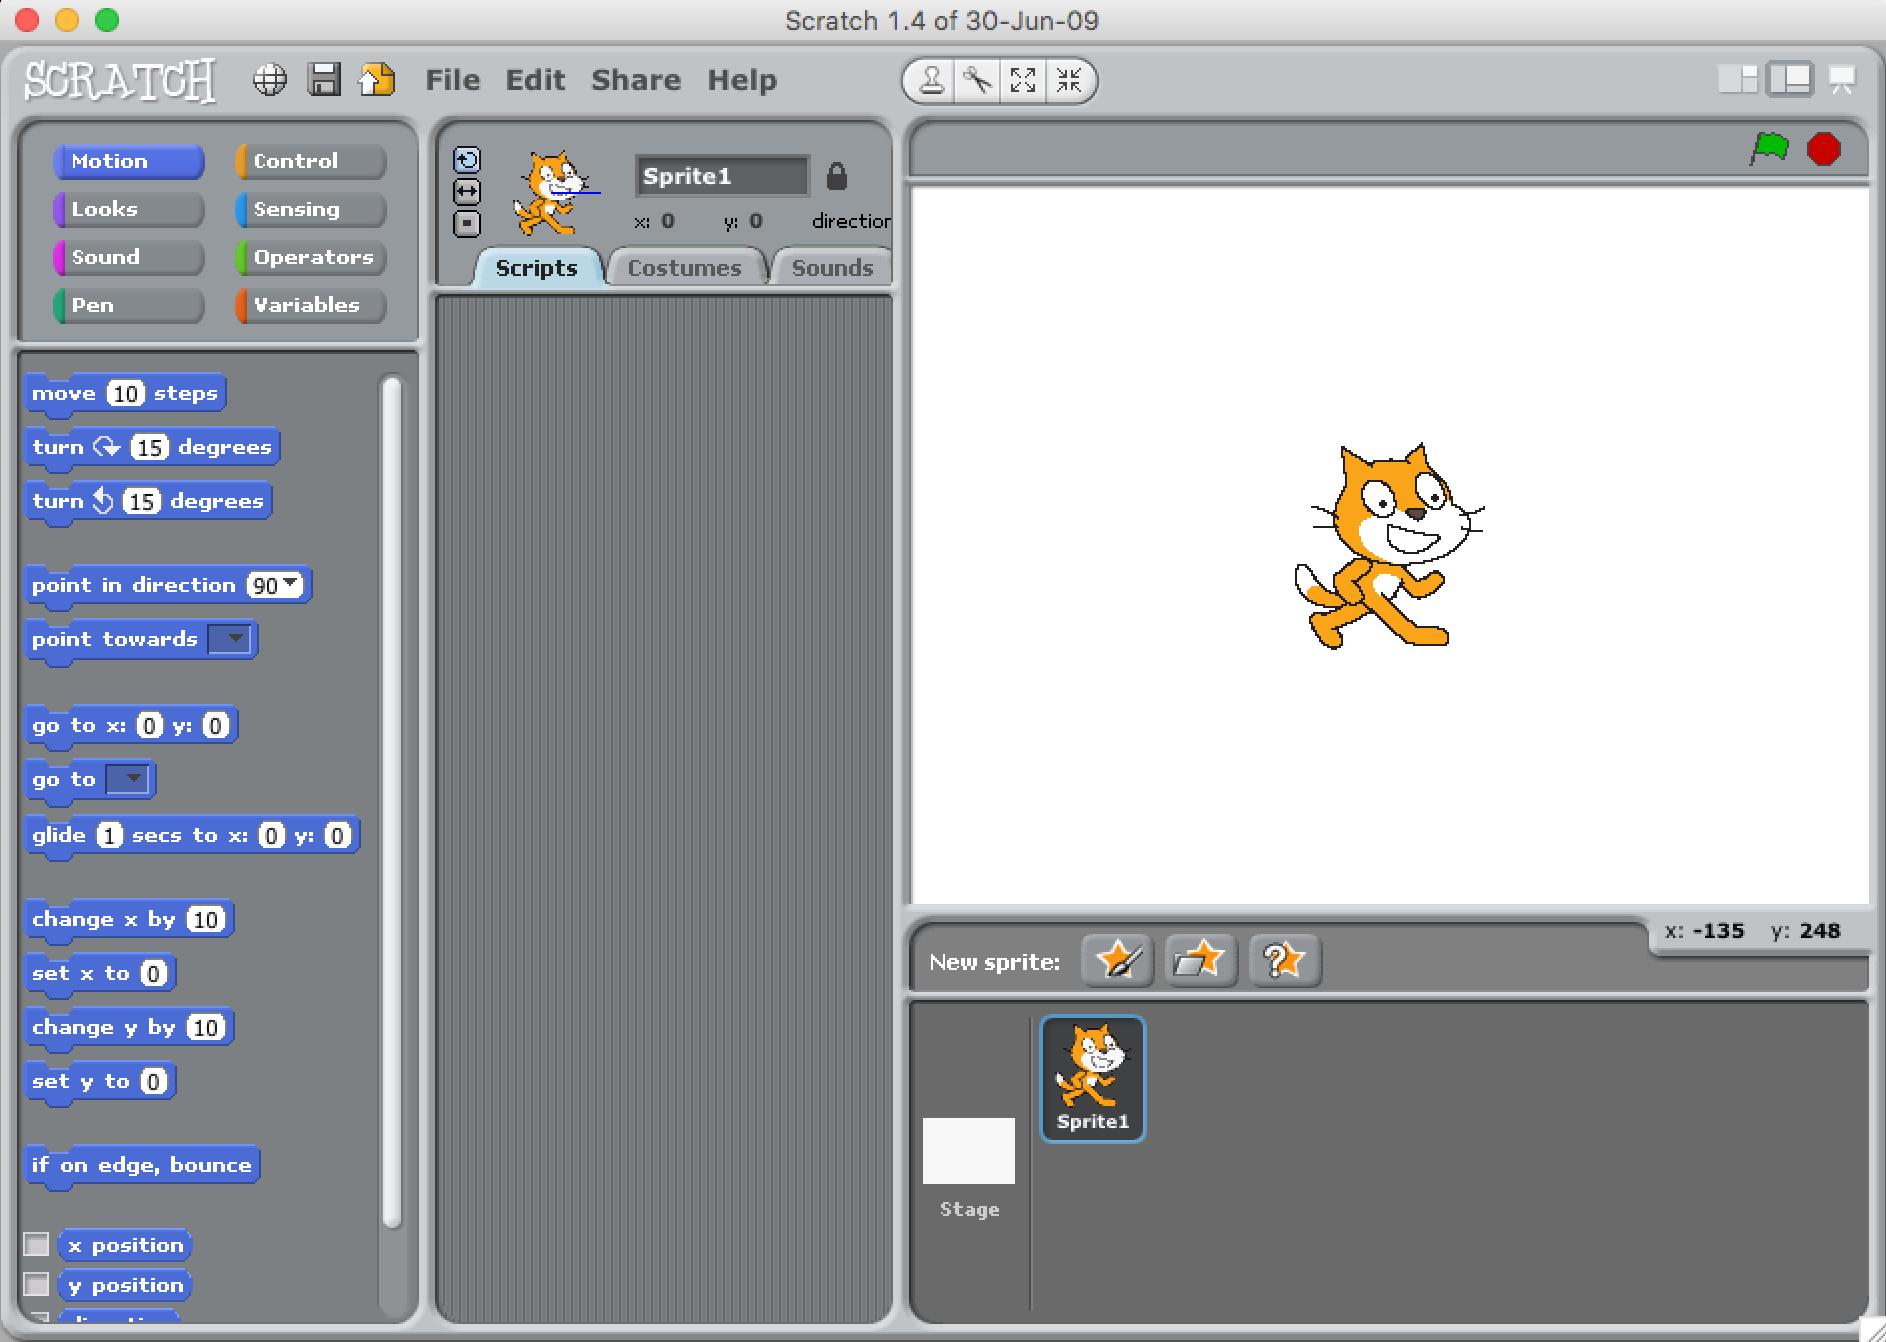 Scratch - Scratch Offline Editor